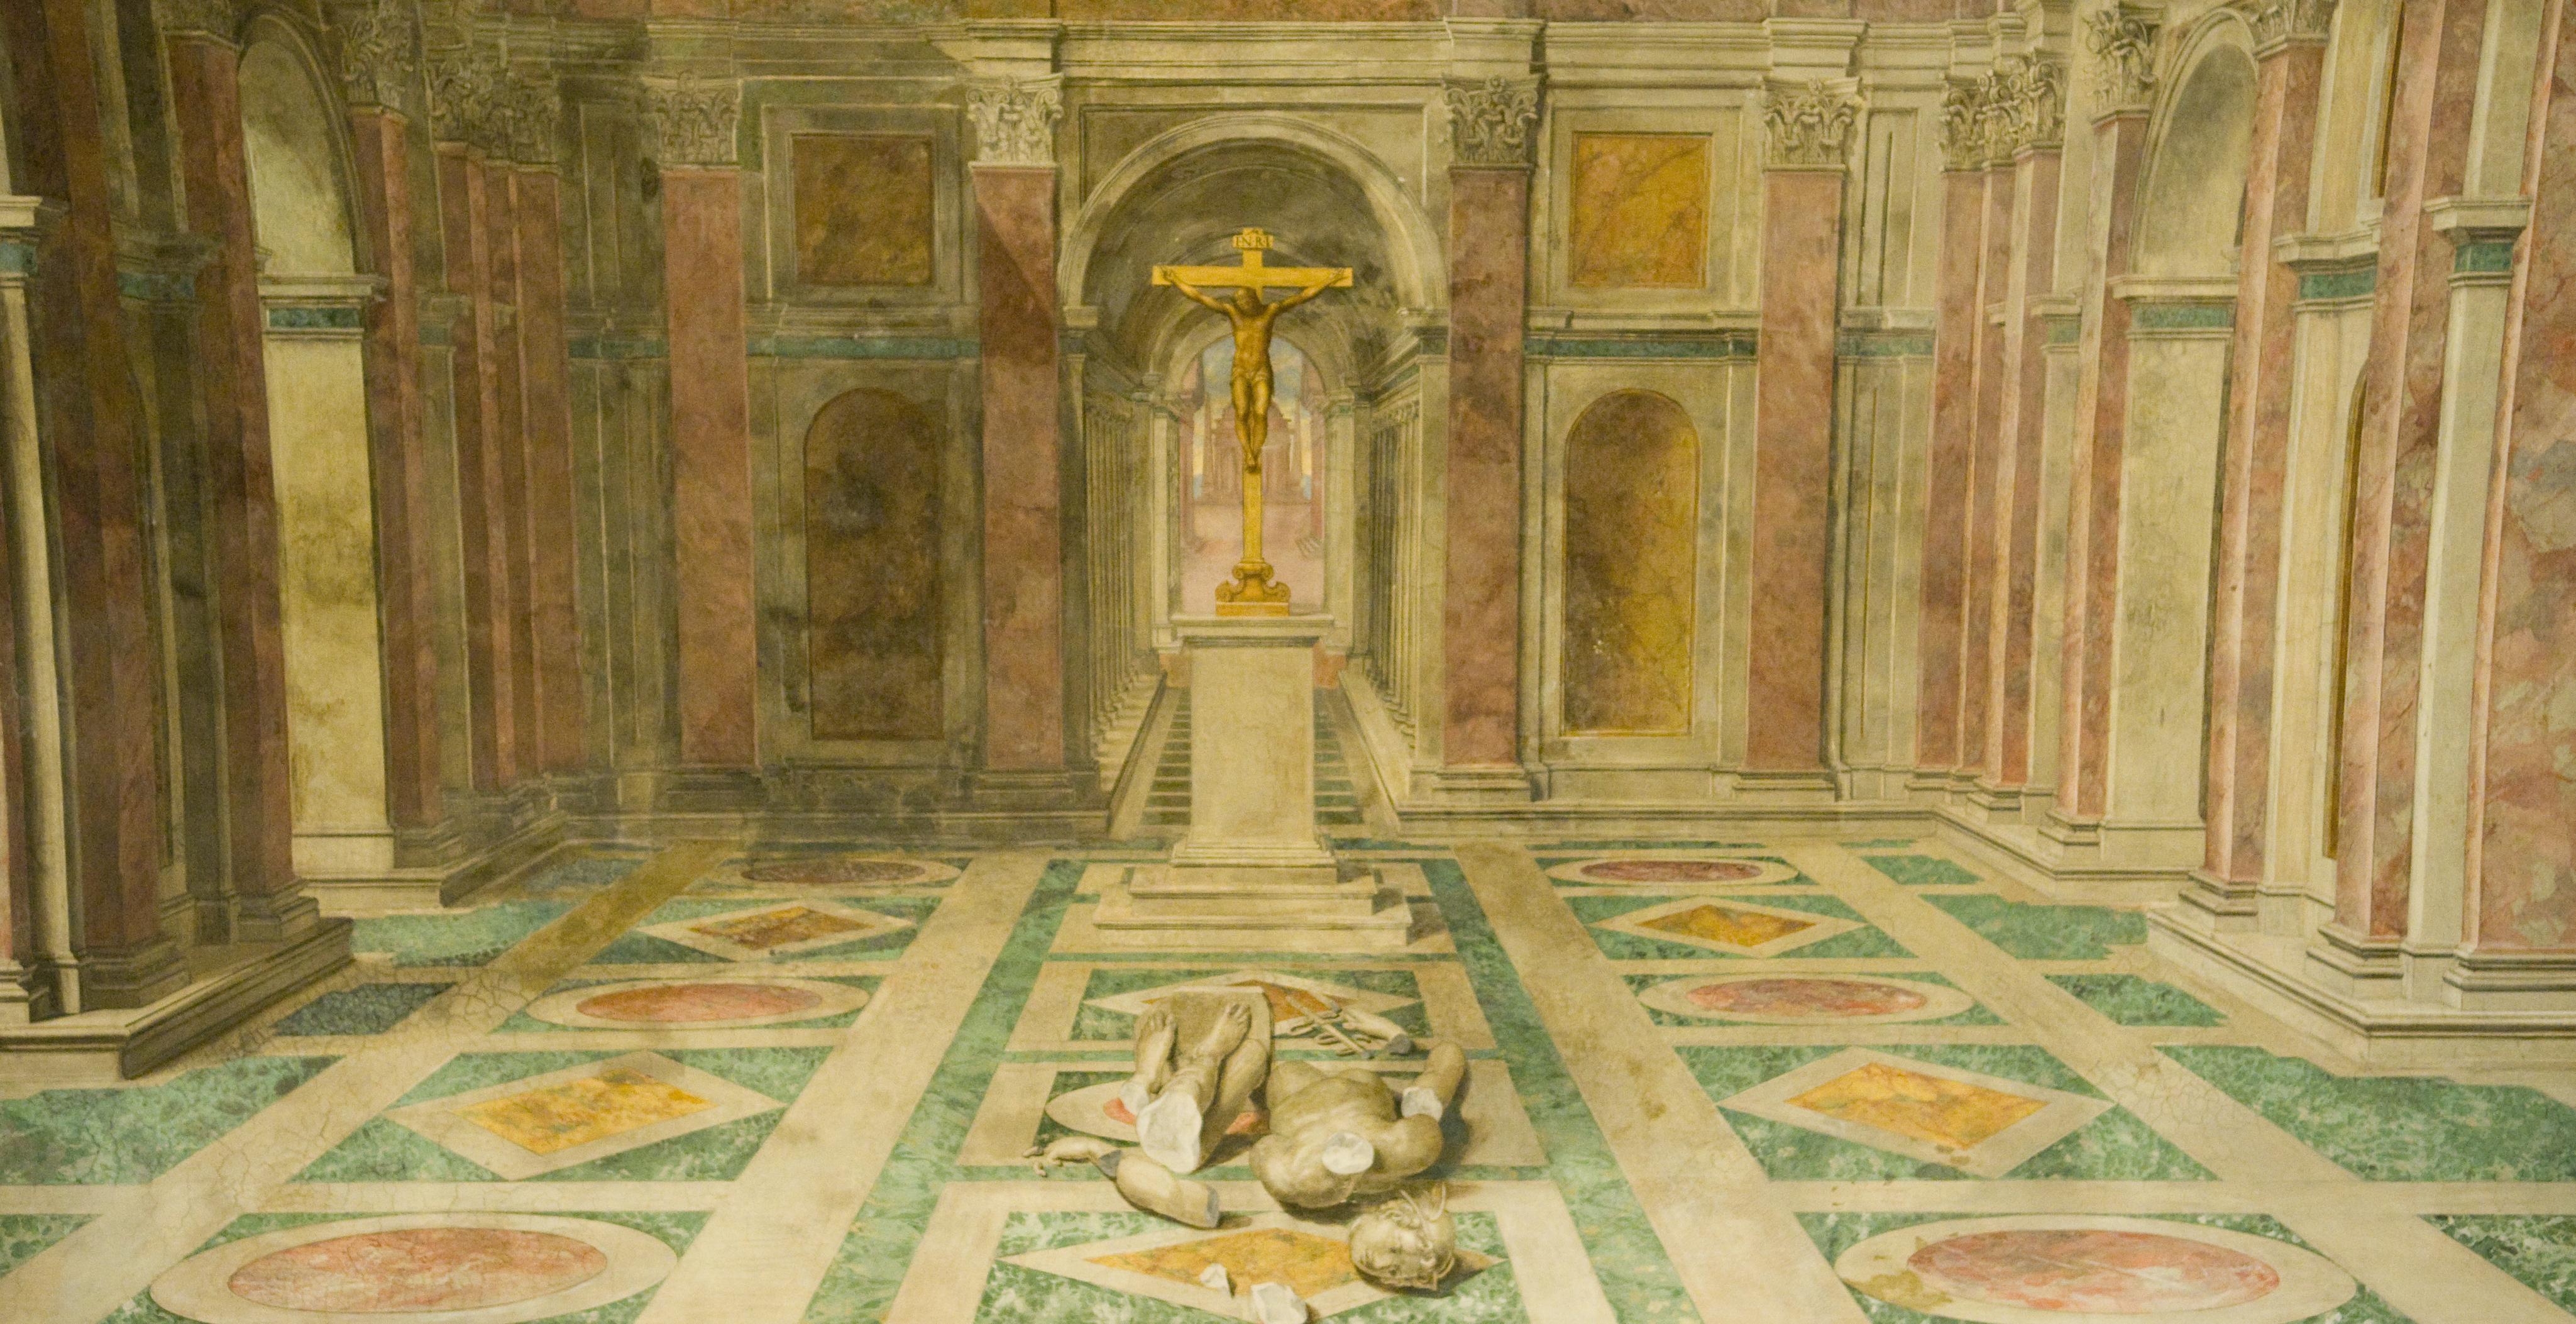 https://upload.wikimedia.org/wikipedia/commons/8/85/%22Triumph_of_Christian_religion%22_by_Laureti%2C_Vatican_Museum_%282994324341%29.jpg